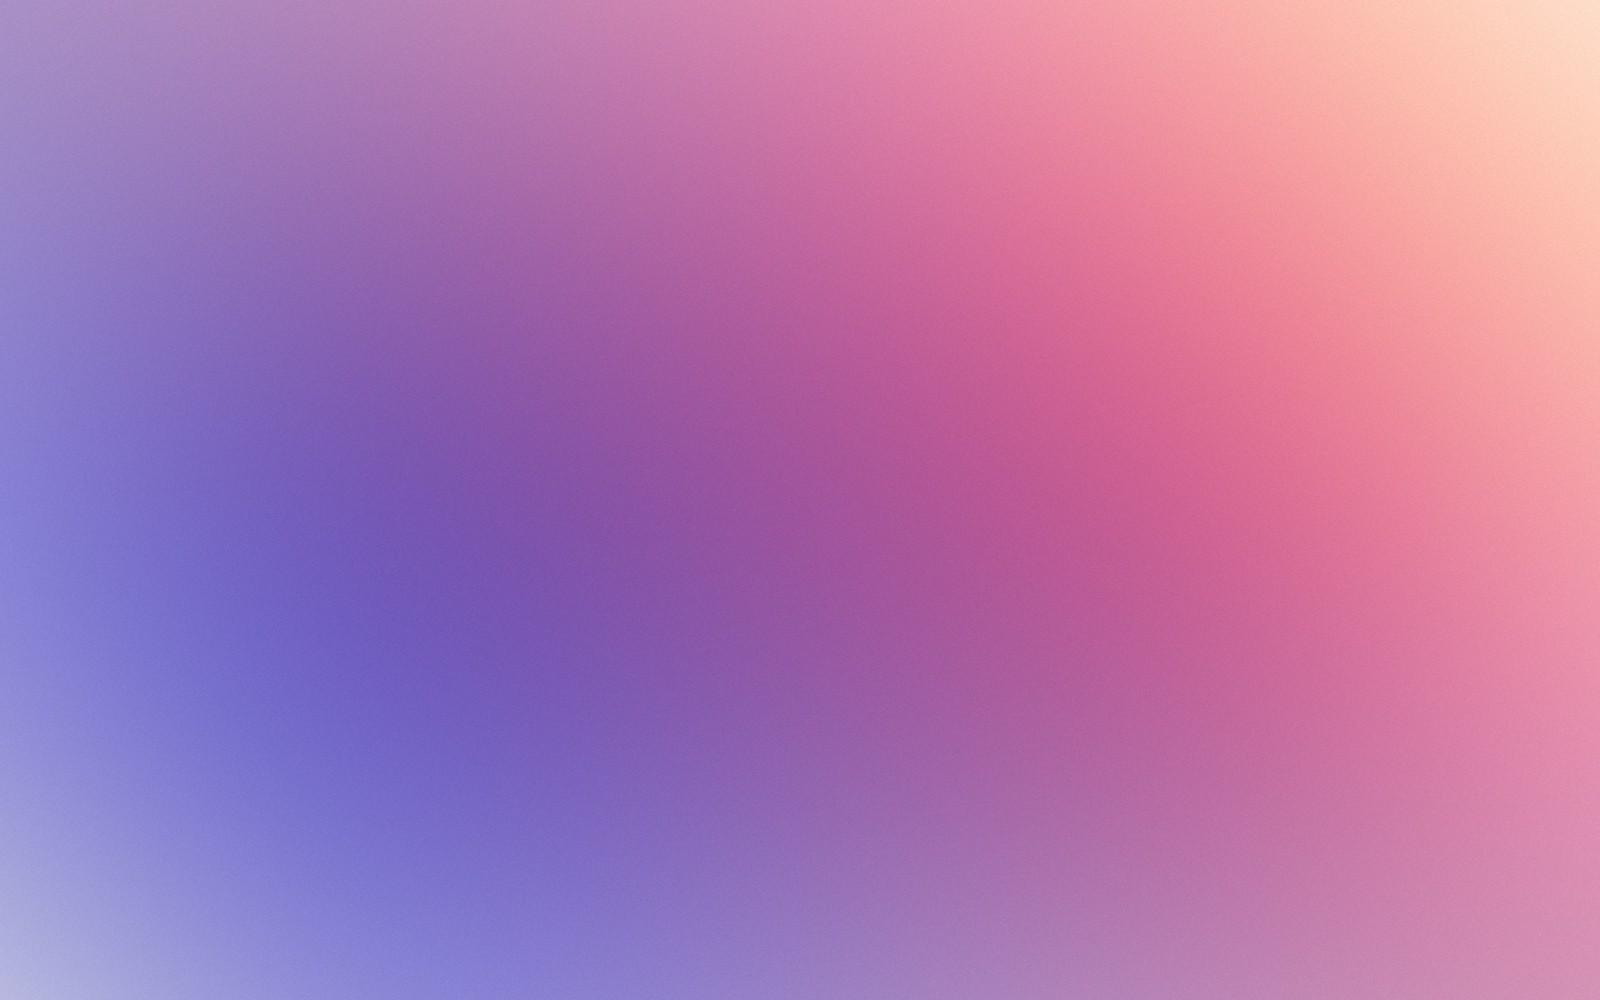 Fondos de colores claros for Fondos de pantalla full hd colores